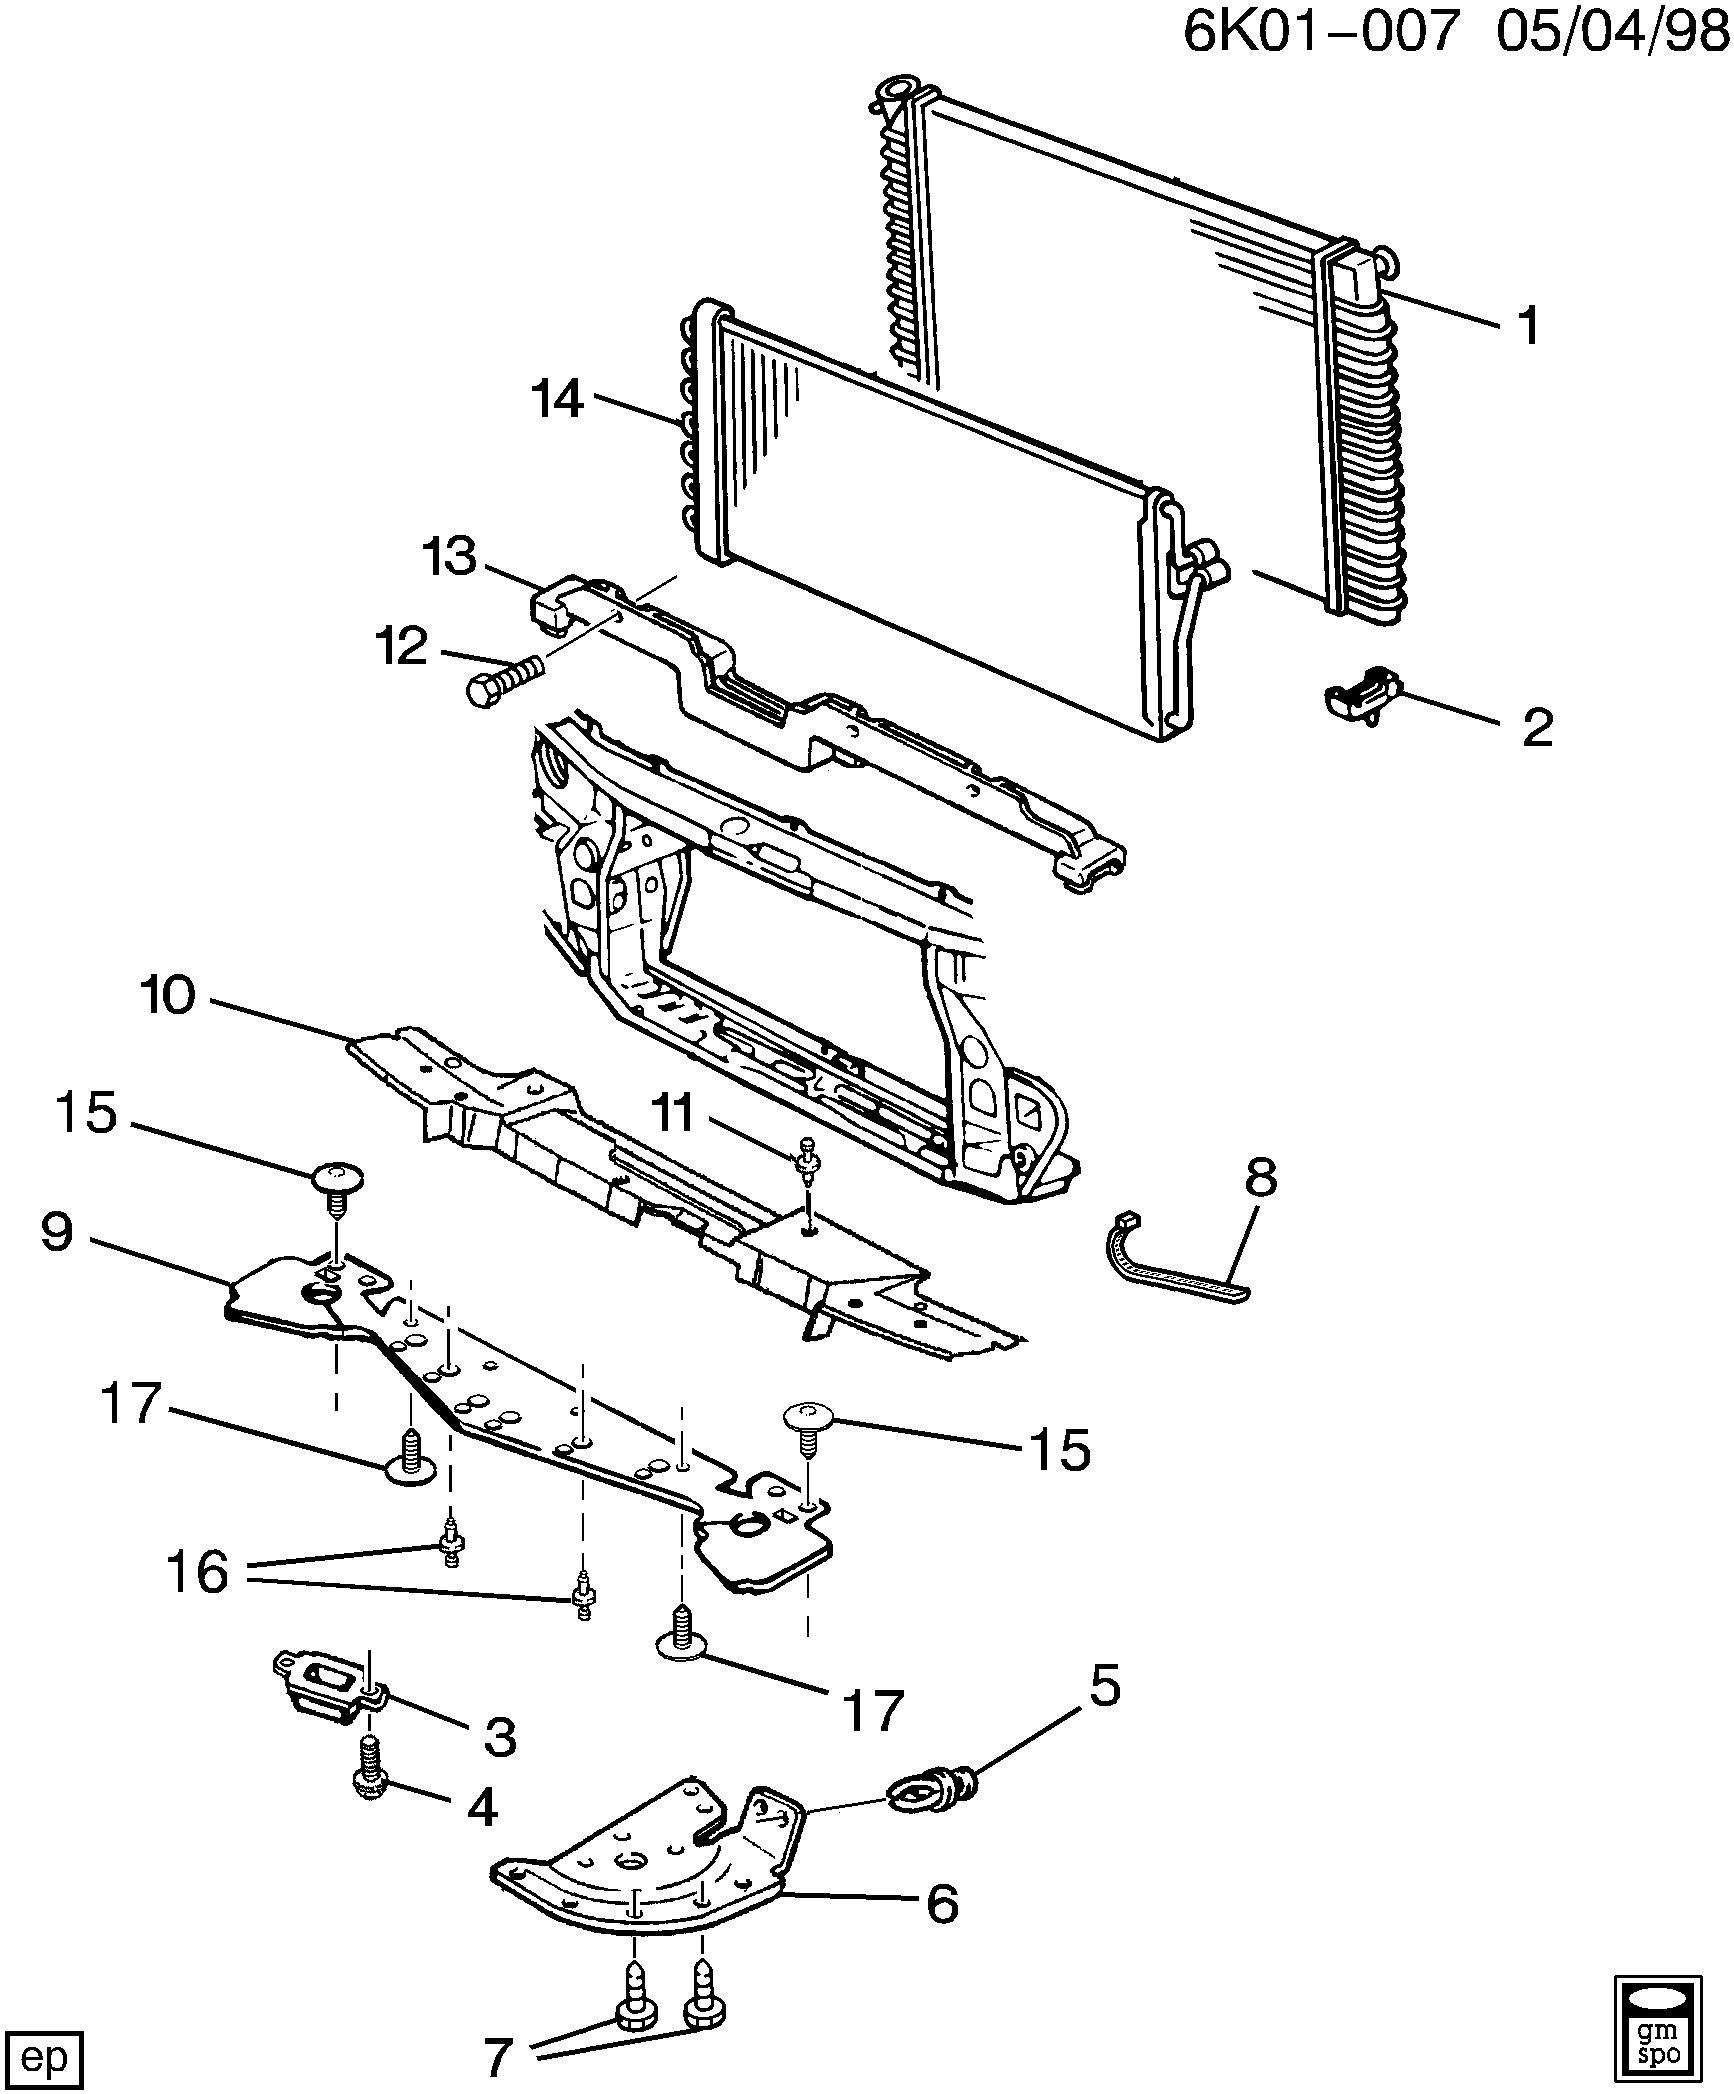 cadillac deville - kf radiator mounting & related parts > epc online >  nemiga.com  parts catalogs